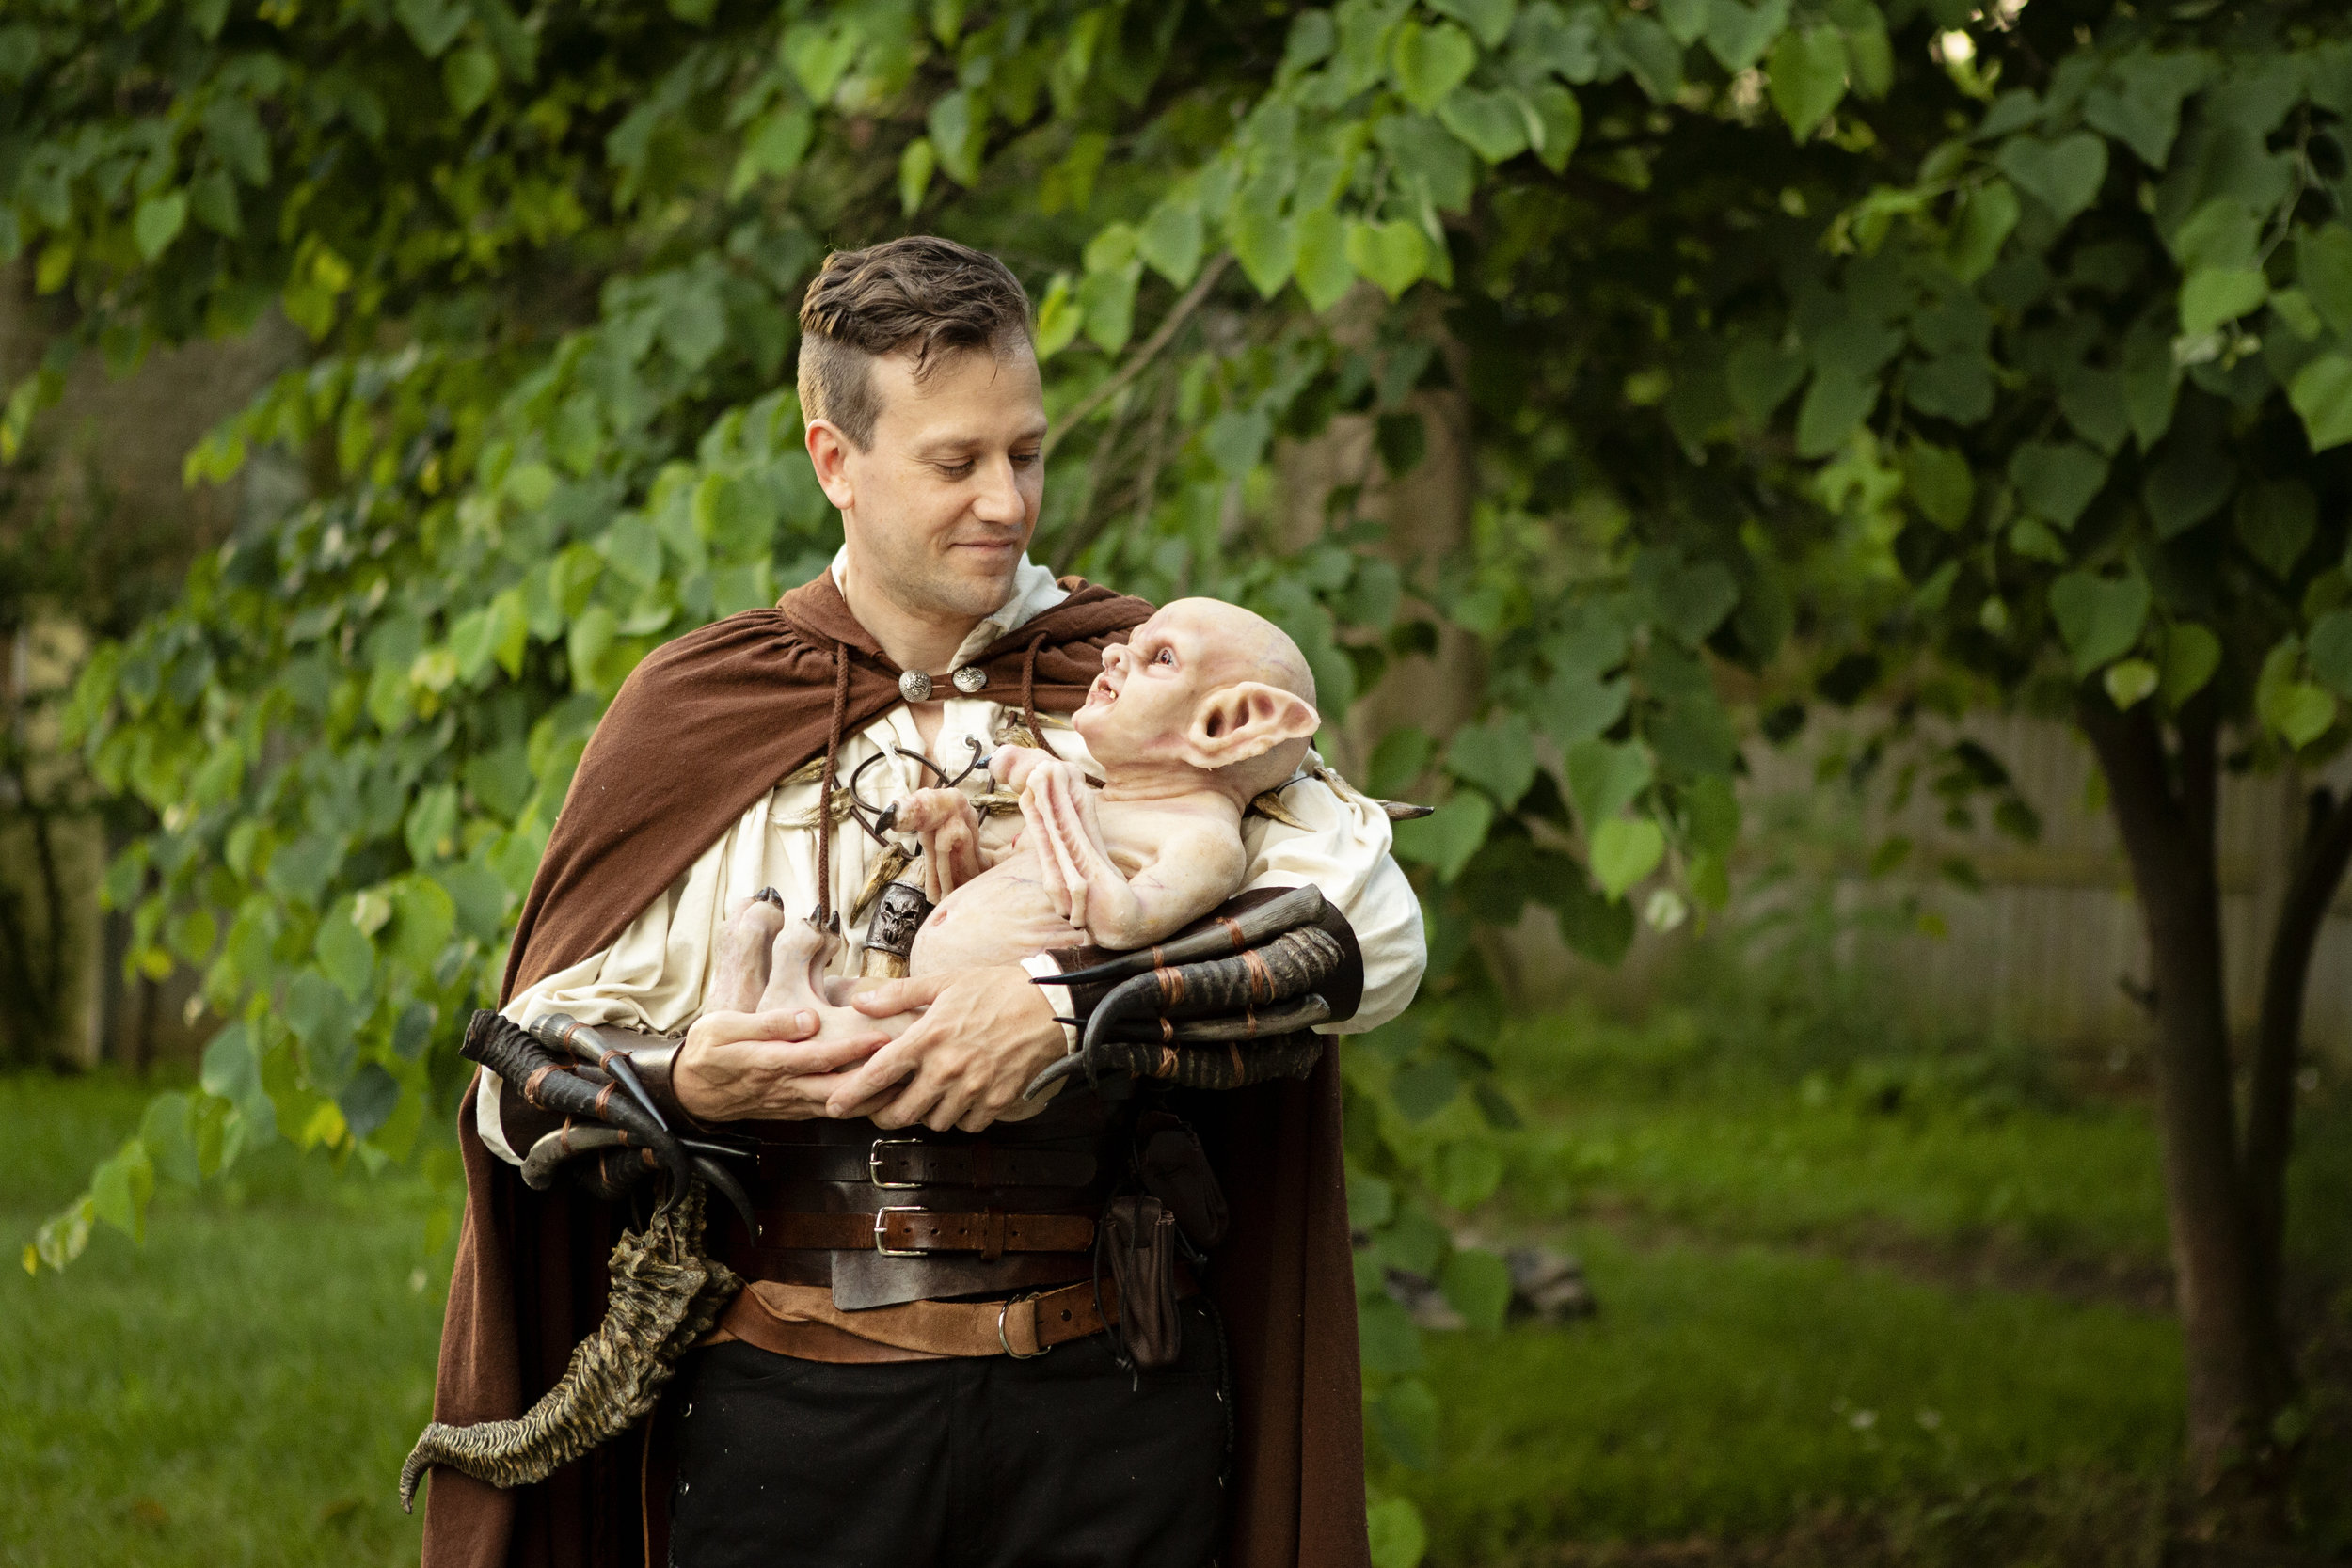 Dad & Baby | Newborn Vampire  | Newborn photoshoot | Ravendark Creations Vampire Baby | Newborn Photoshoots | Alyssia Booth's Candid & Studio | www.abcandidstudio.com